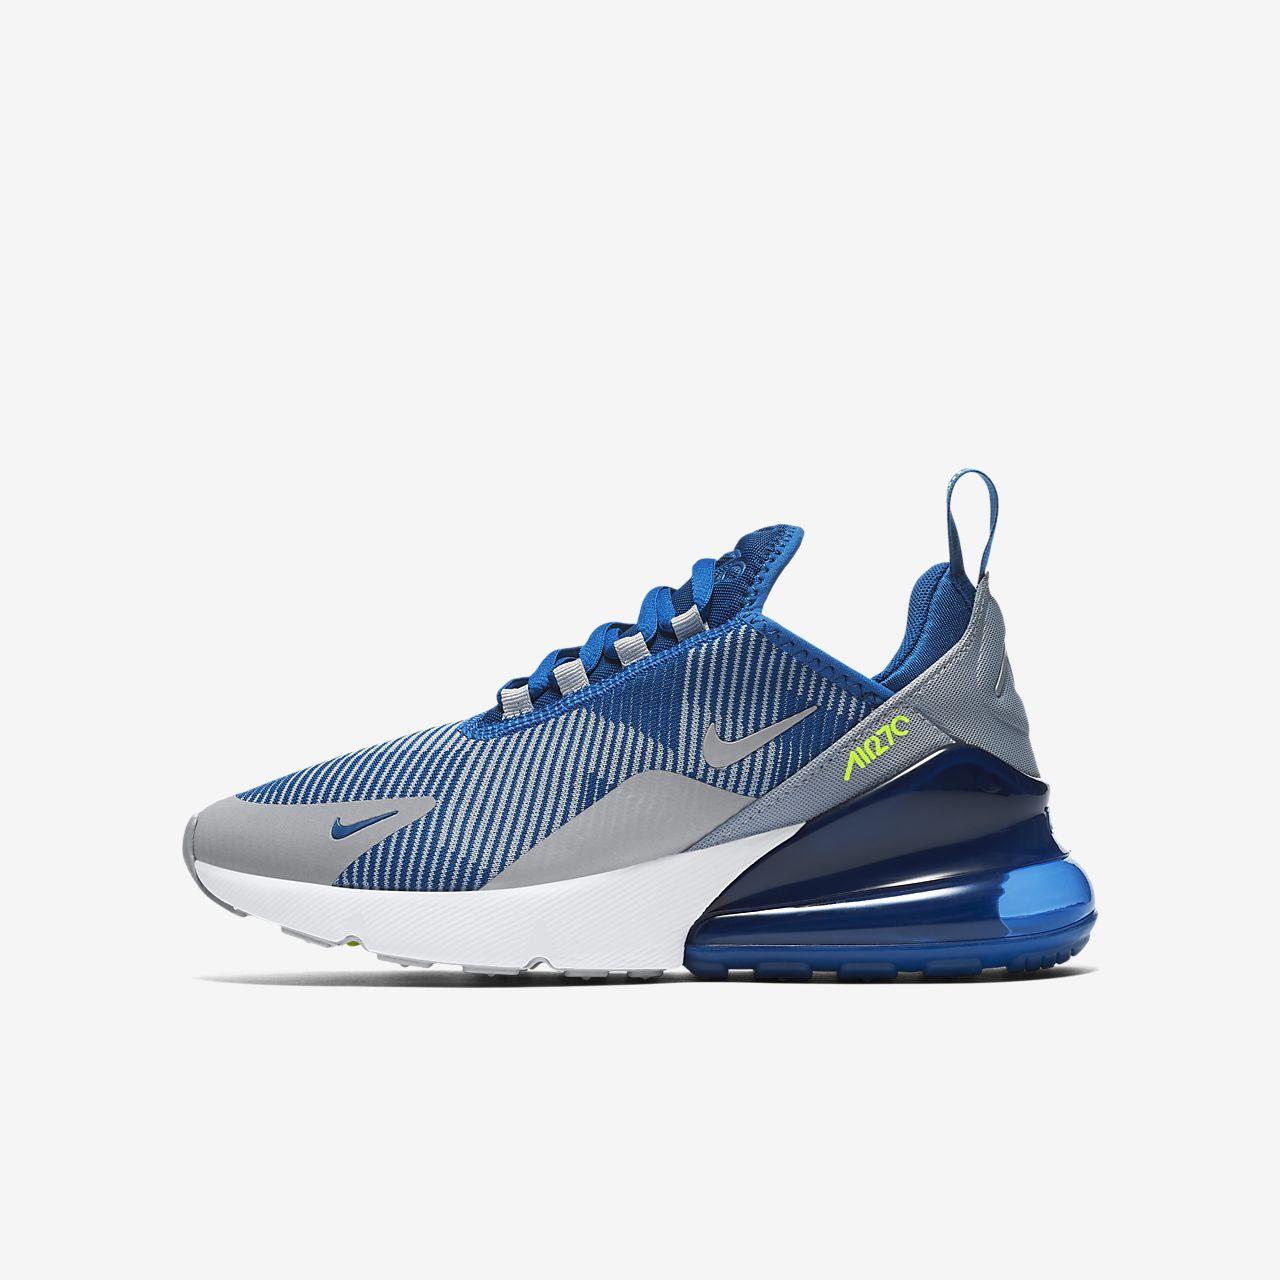 Nike Air Max 270 KJCRD (GS)大童运动童鞋